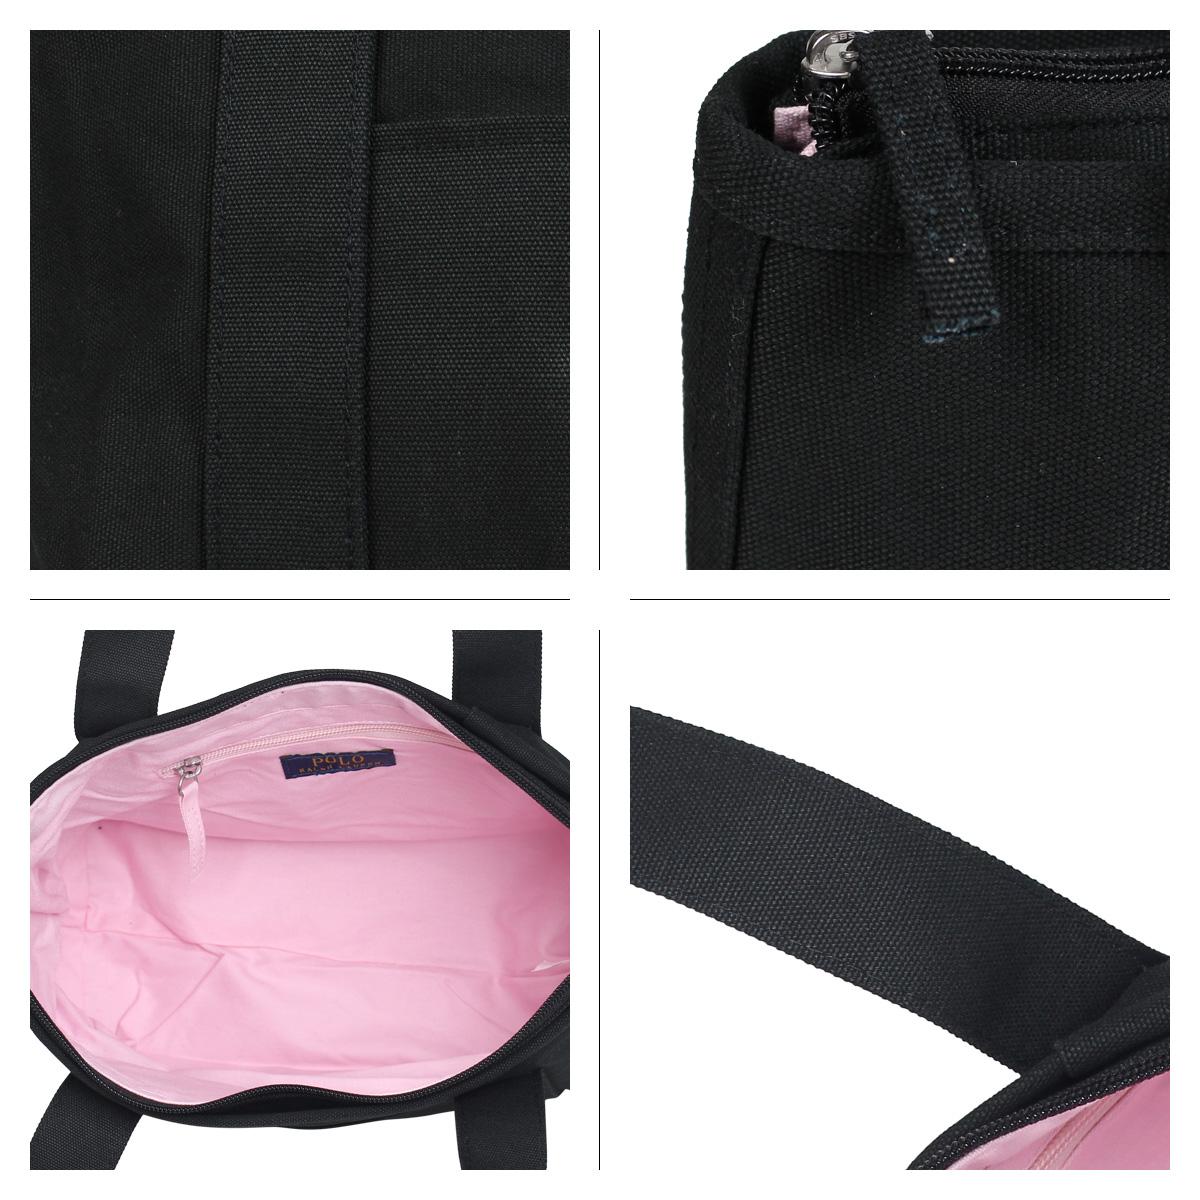 838c4730451 ... POLO RALPH LAUREN MEDIUM TOTE polo Ralph Lauren bag tote bag men gap  Dis canvas black